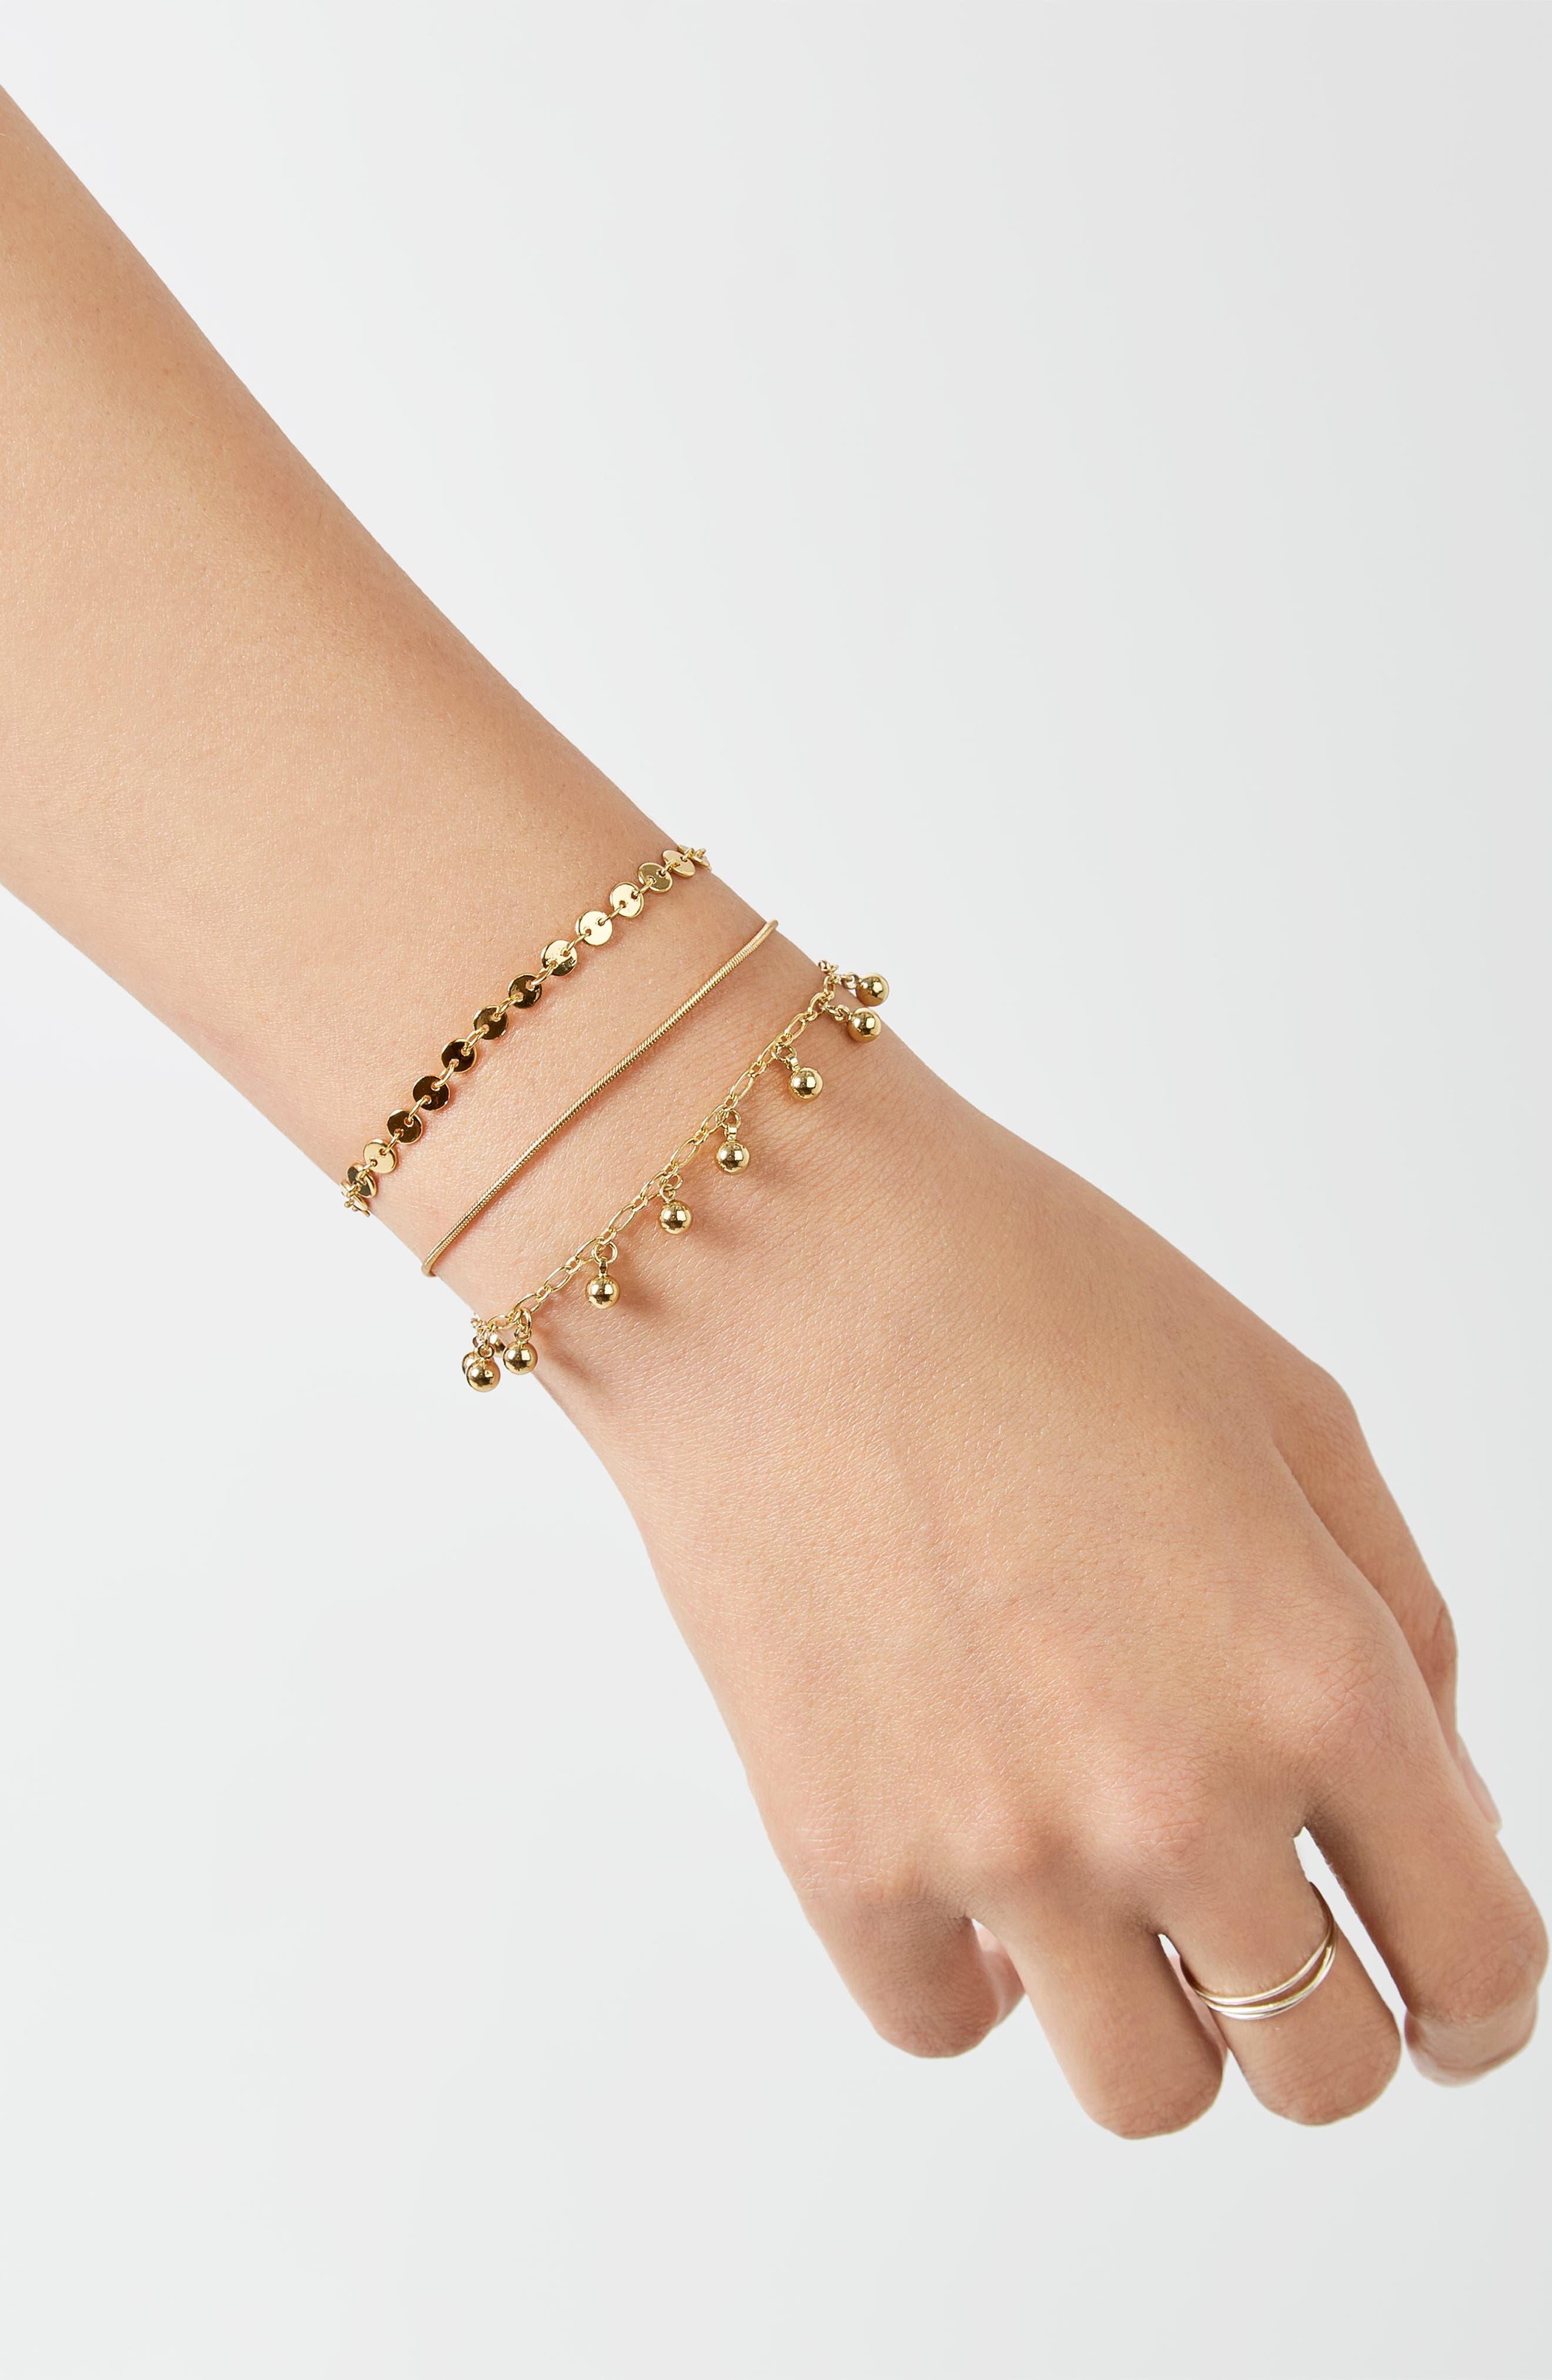 Asteria Set of 3 Bracelets,                             Alternate thumbnail 2, color,                             GOLD